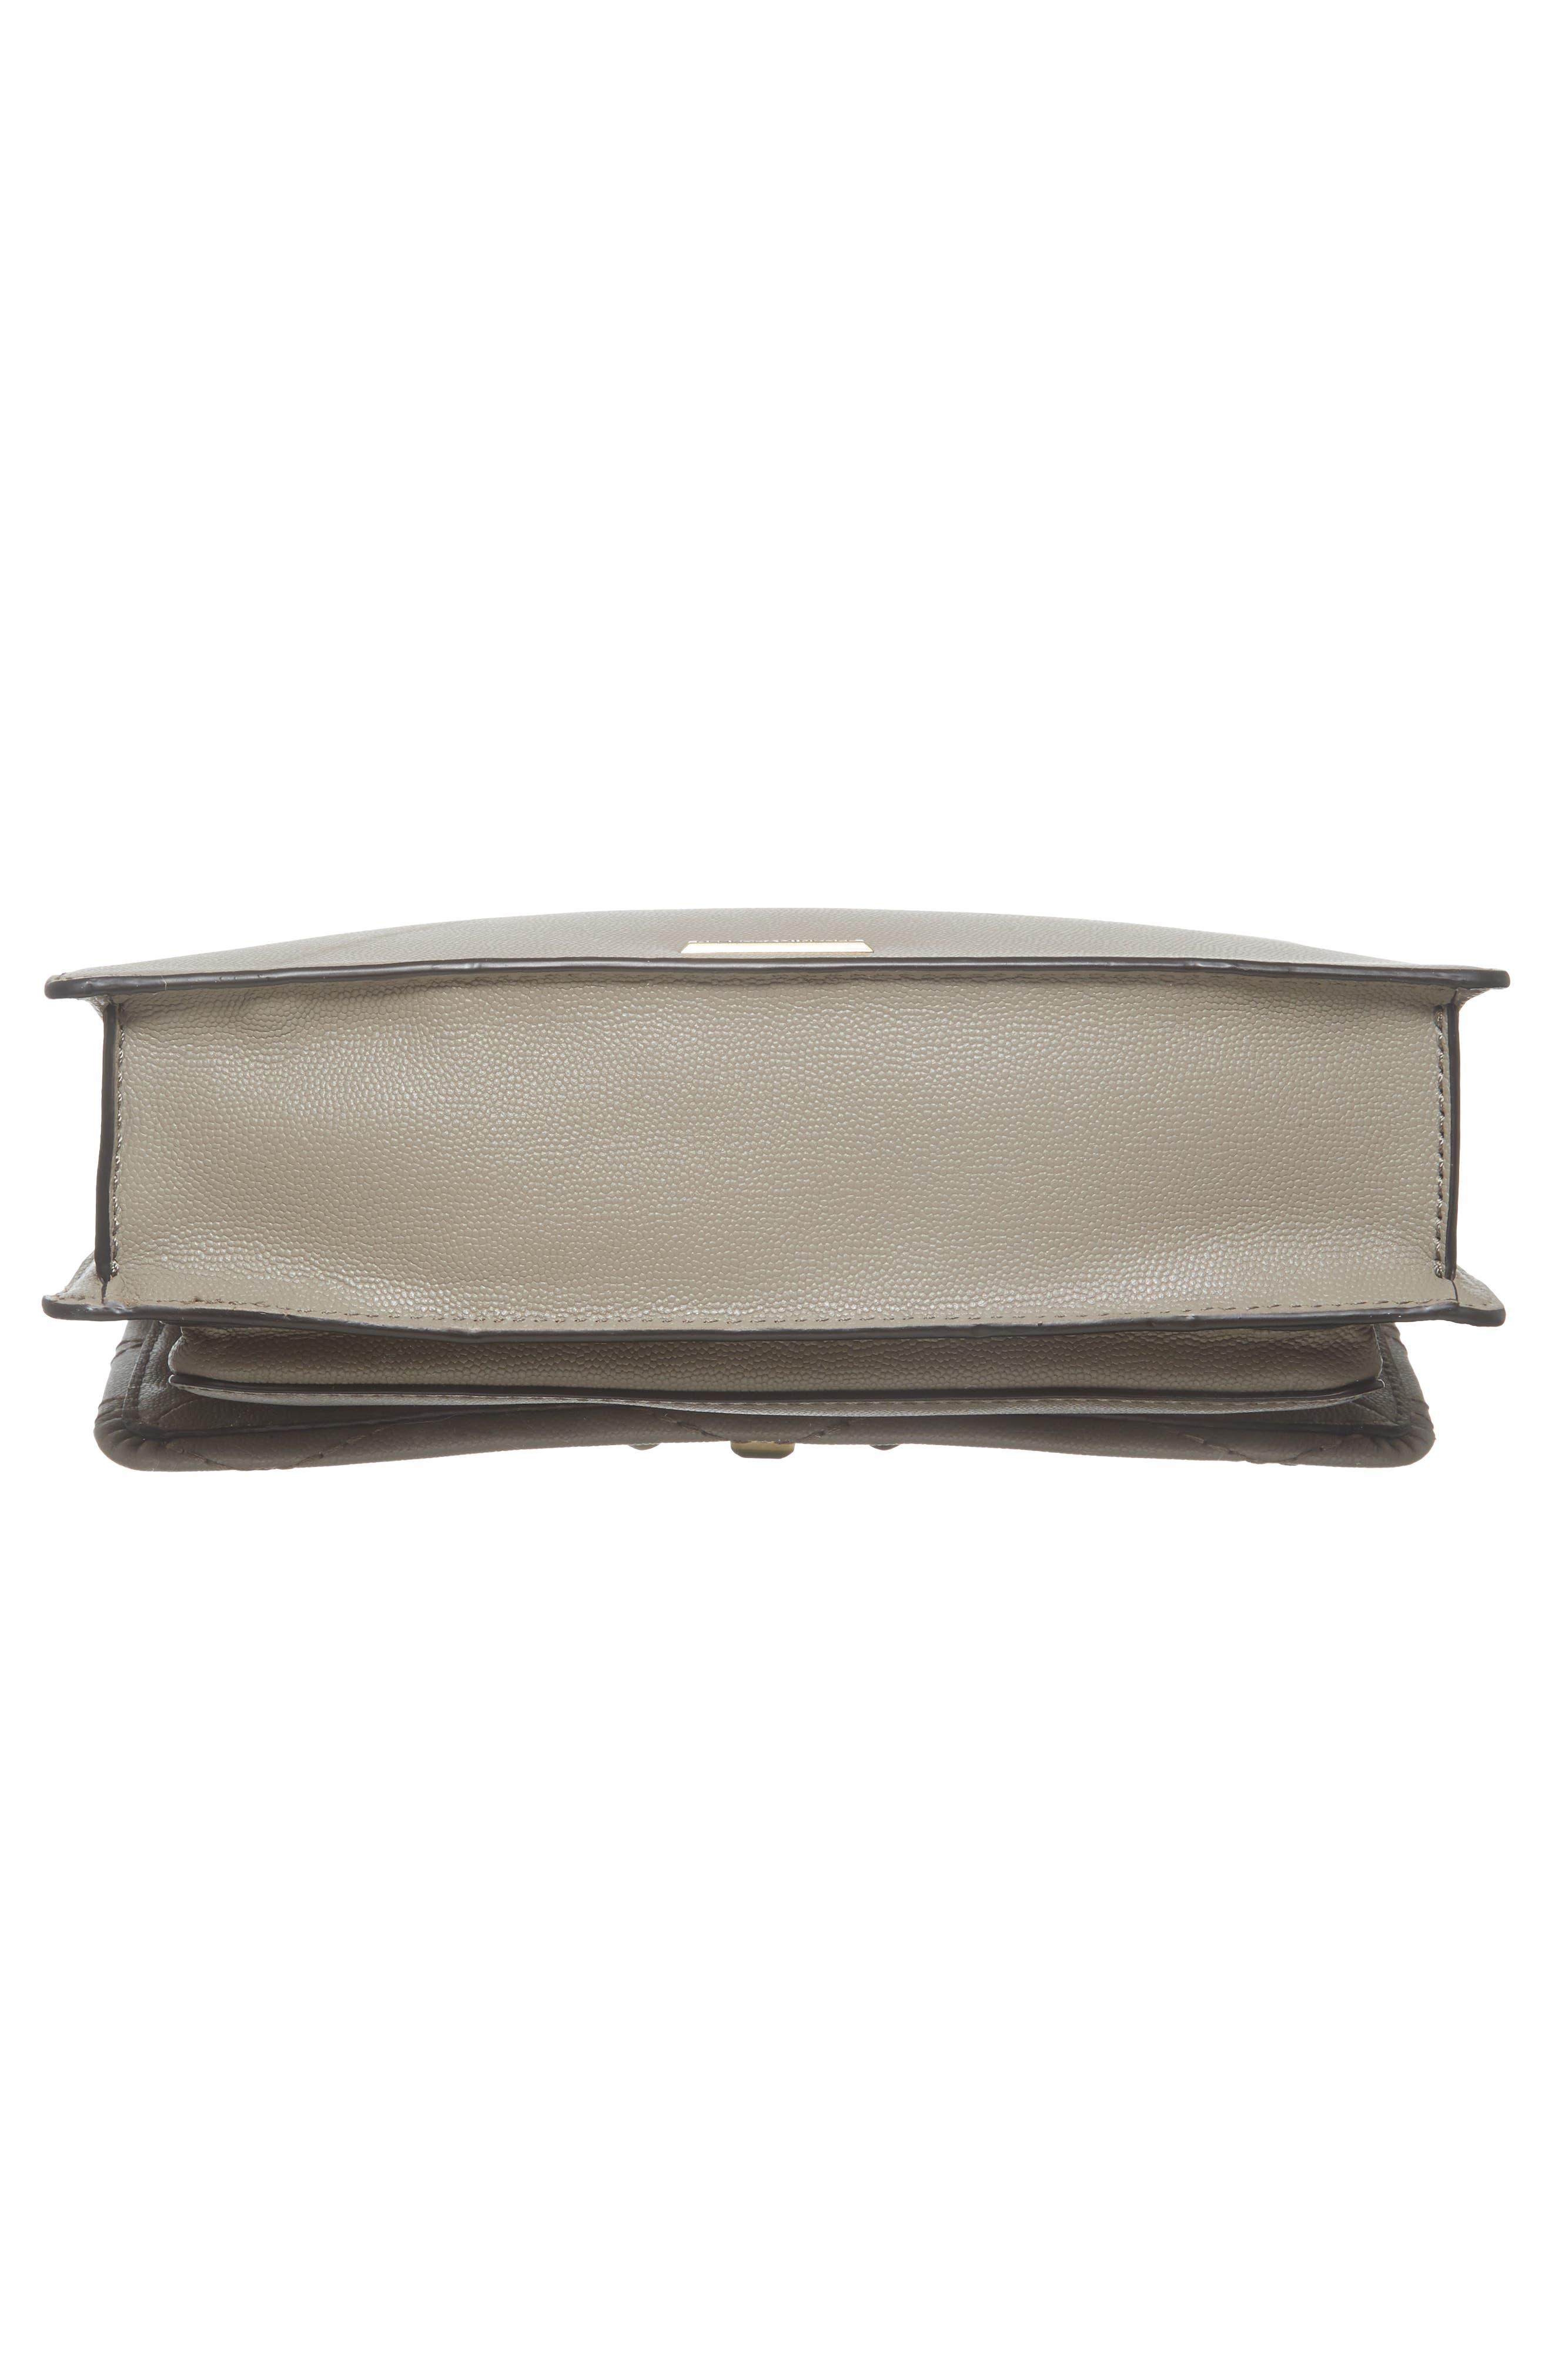 Medium Je T'aime Convertible Leather Crossbody Bag,                             Alternate thumbnail 54, color,